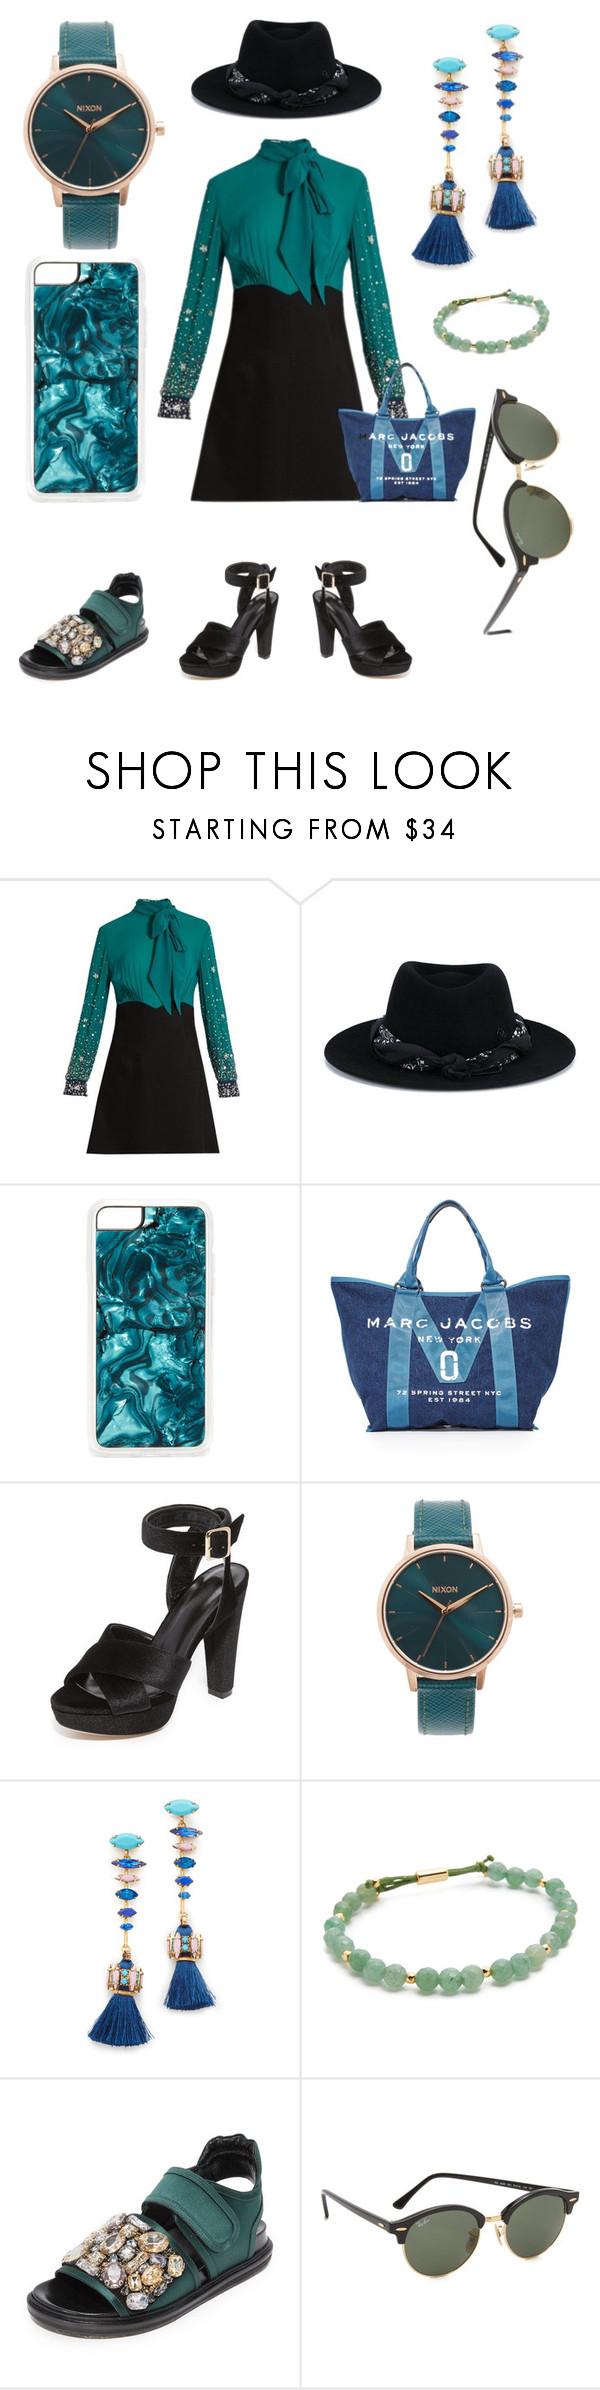 """Greenish fashion"" by gadinarmada-1 ❤ liked on Polyvore featuring Miu Miu, Maison Michel, Zero Gravity, Marc Jacobs, Raye, Nixon, Elizabeth Cole, Gorjana, Marni and Ray-Ban"